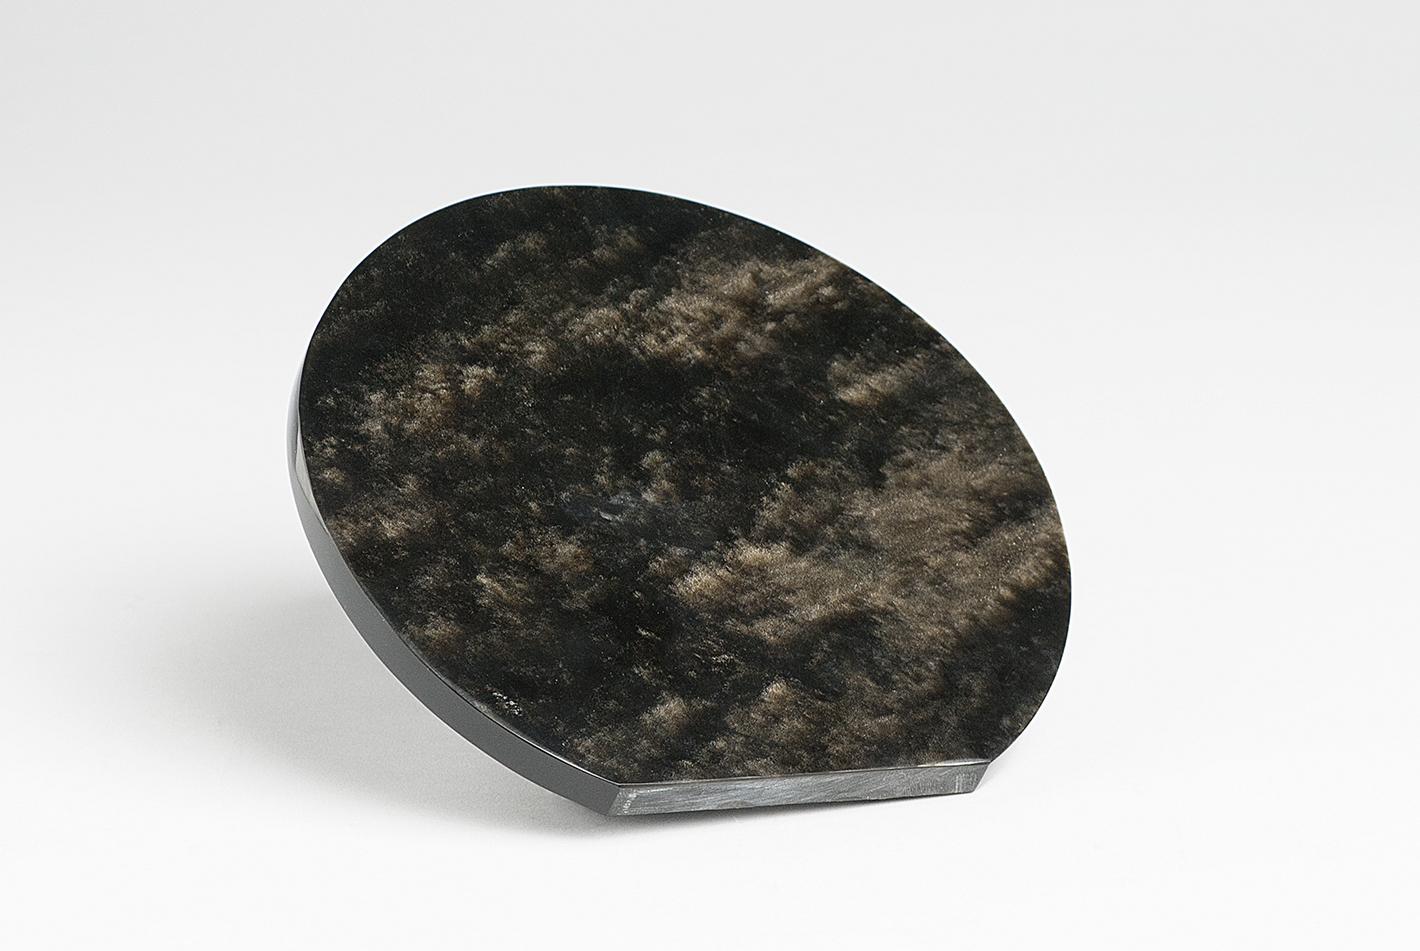 web2-Obsidian-Anahuac_DSC0085a-Mexico-Design-Time-Marion-Friedmann.jpg